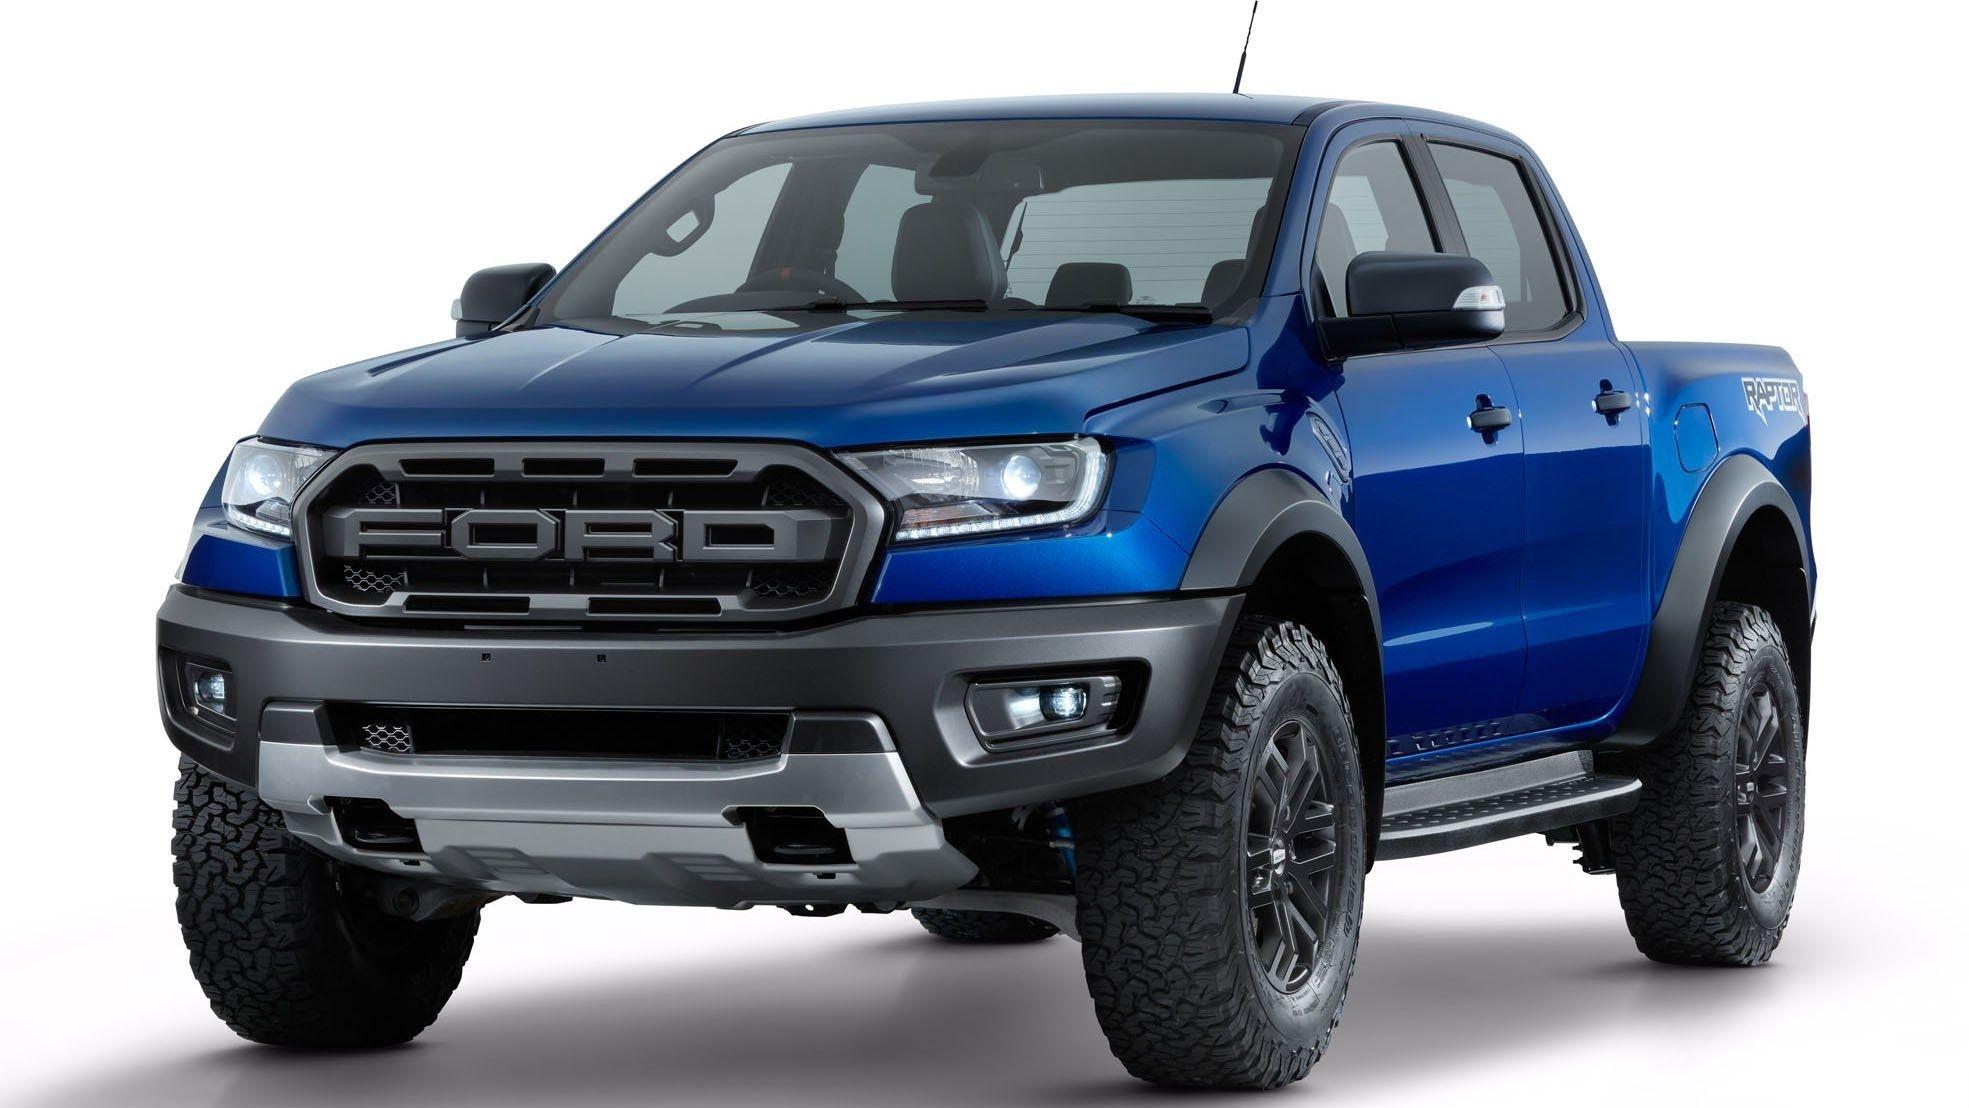 New Ford Ranger Raptor Msrp Https Jetsuv Com New Ford Ranger Raptor Msrp Fordcars 2018fordrange Ford Ranger Wildtrak Ford Ranger Raptor 2019 Ford Ranger